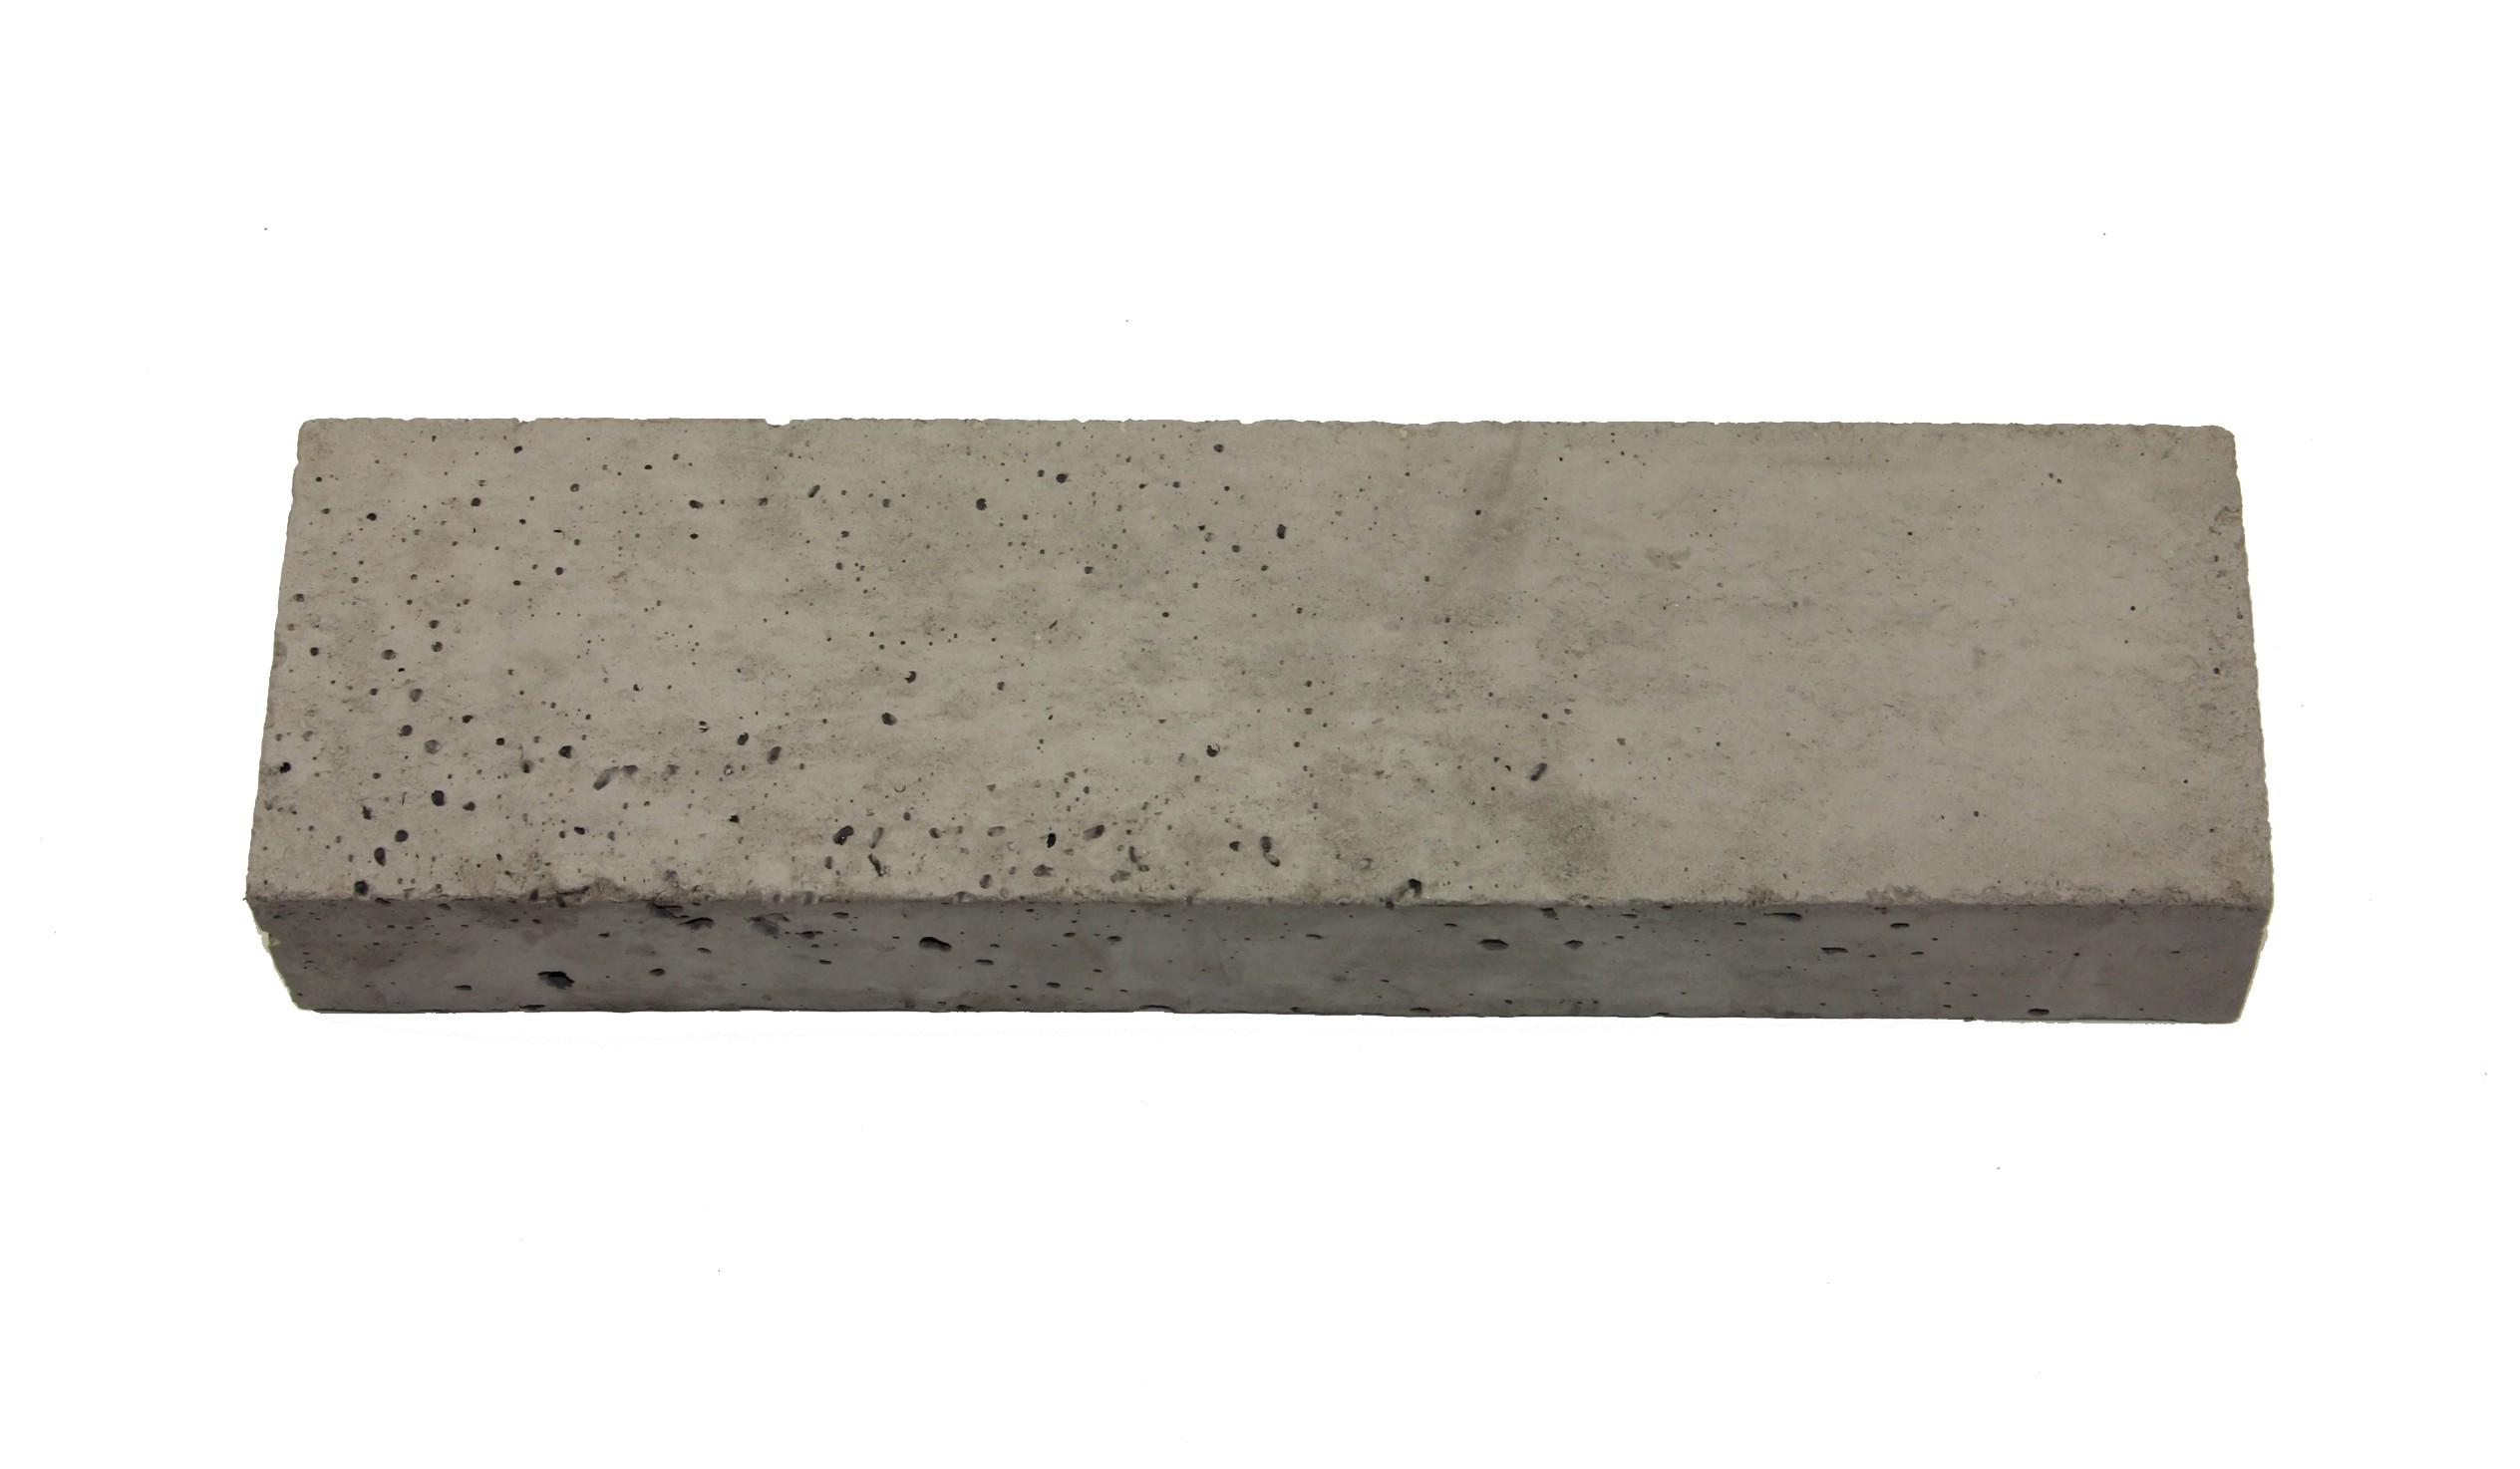 Solatiili E-75-800, 50x95x325